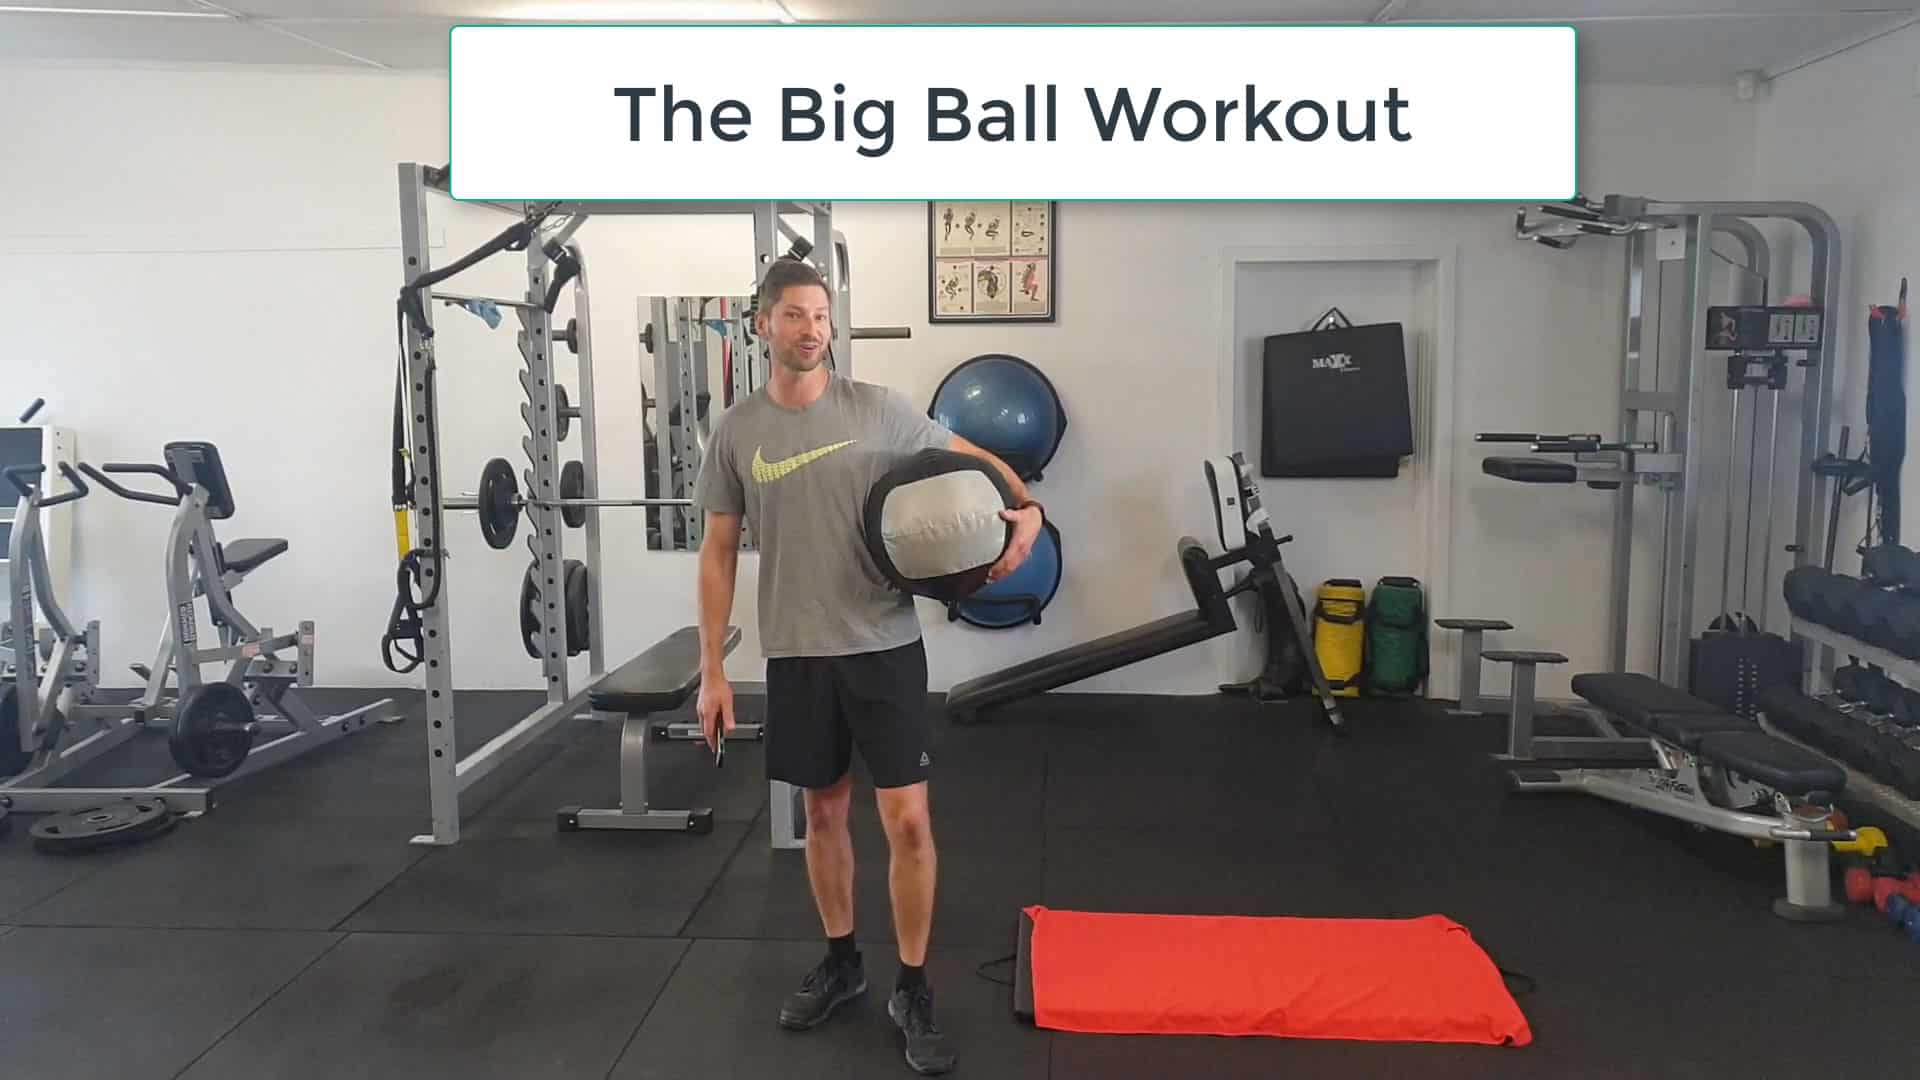 The Big Ball Workout